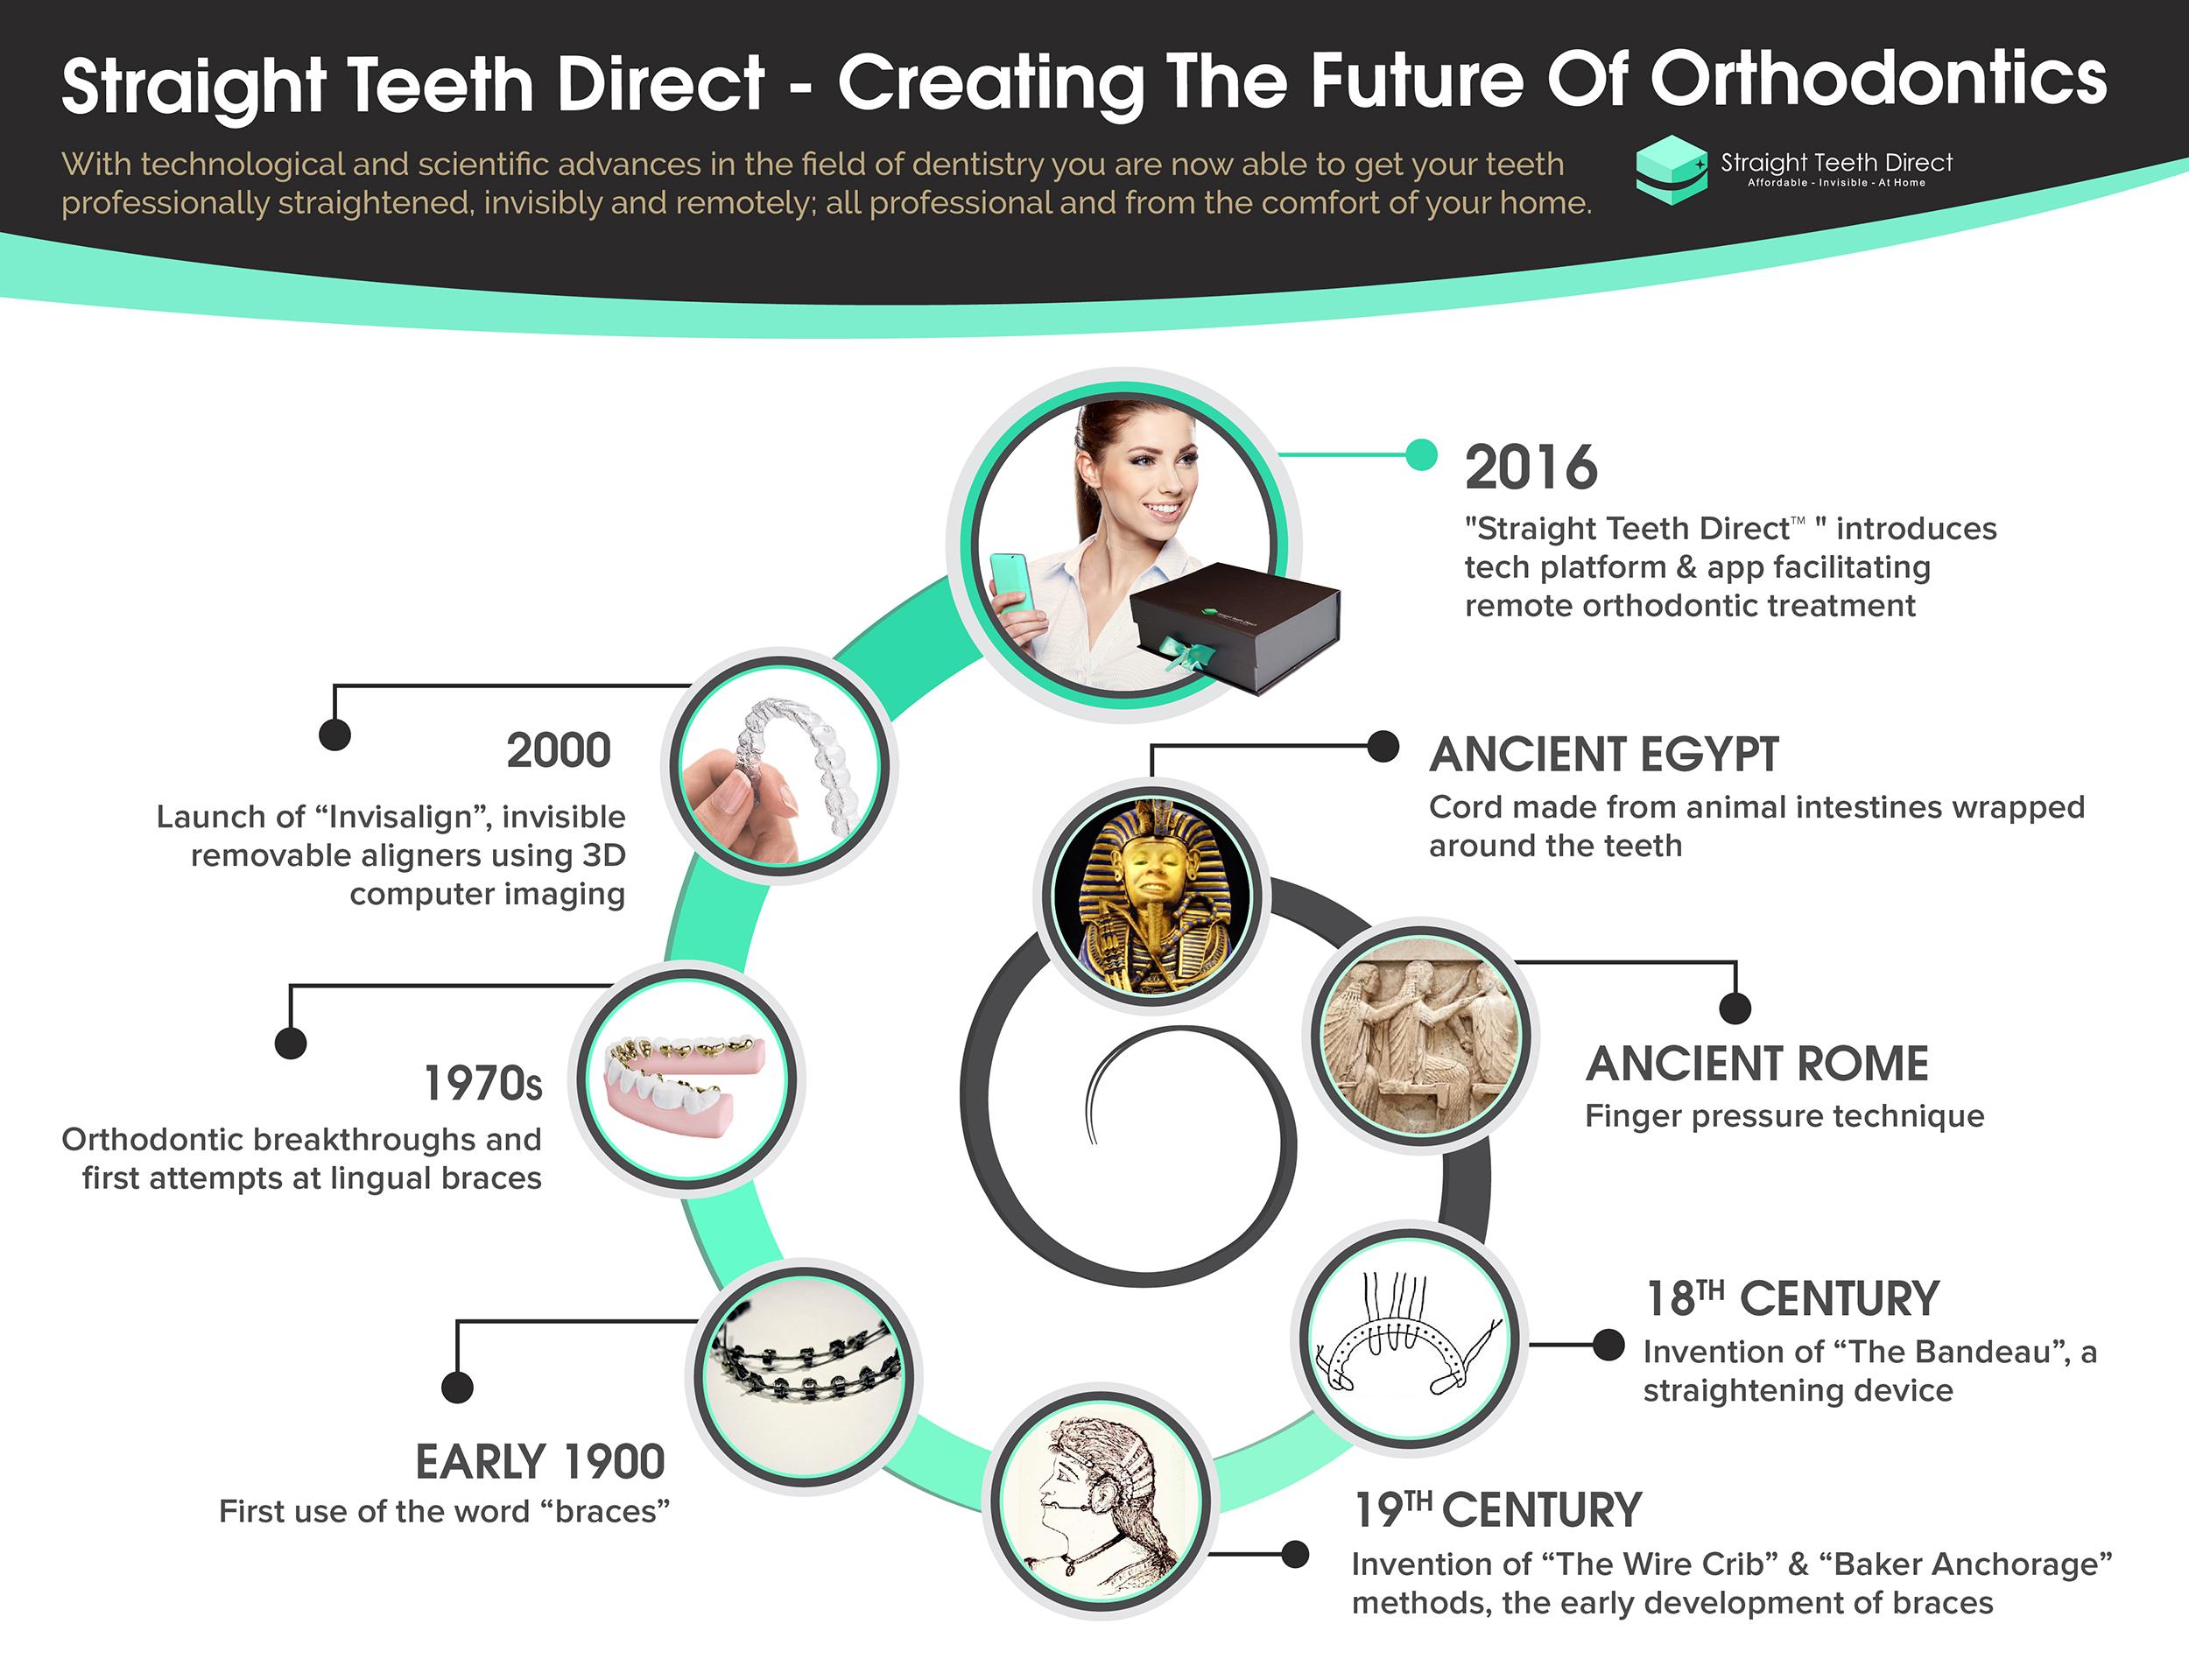 Straight Teeth Direct - History of Aligners